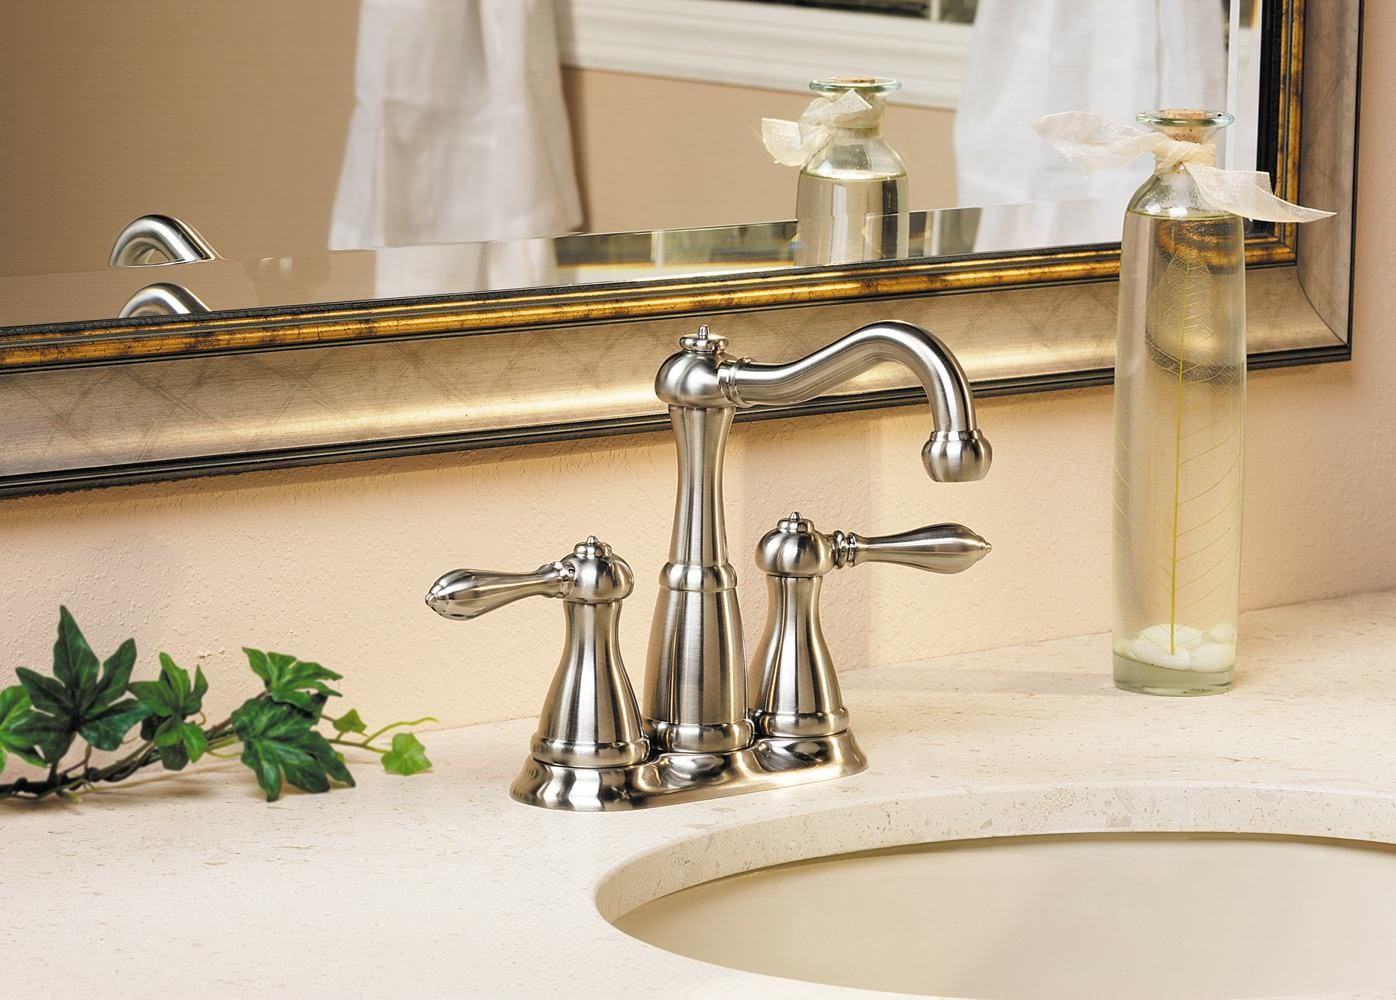 Styles Of Bathroom Faucets-Brushed Nickel